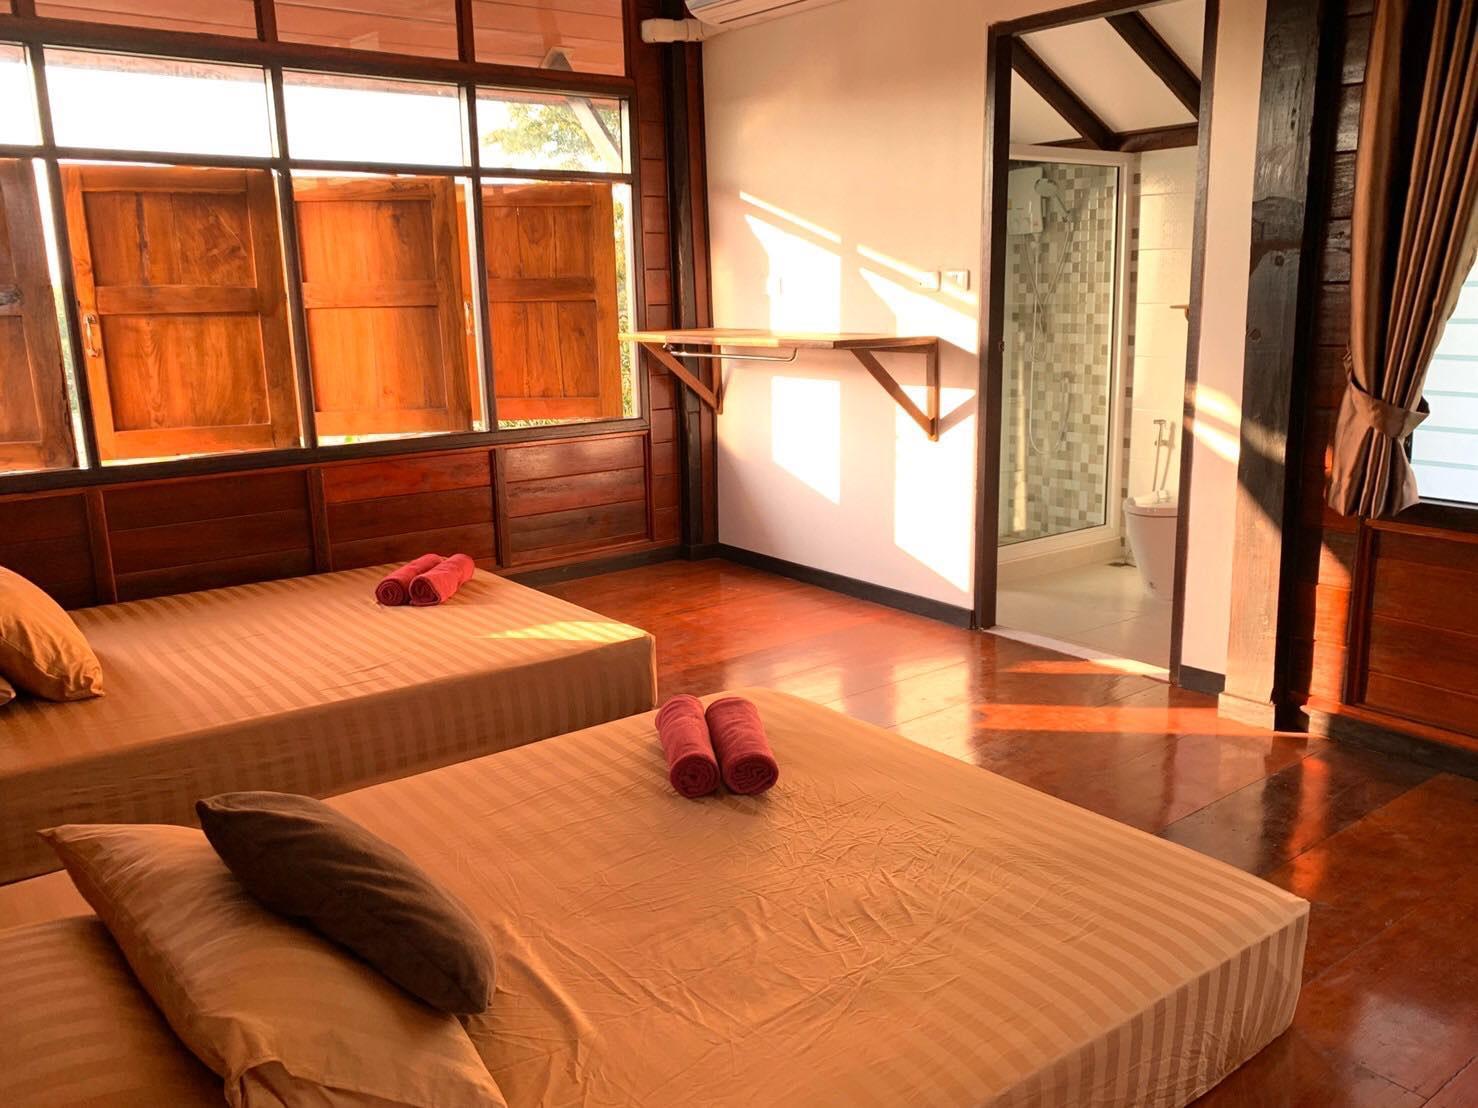 Baan Thai Pattaya บ้านเดี่ยว 2 ห้องนอน 2 ห้องน้ำส่วนตัว ขนาด 200 ตร.ม. – บางละมุง